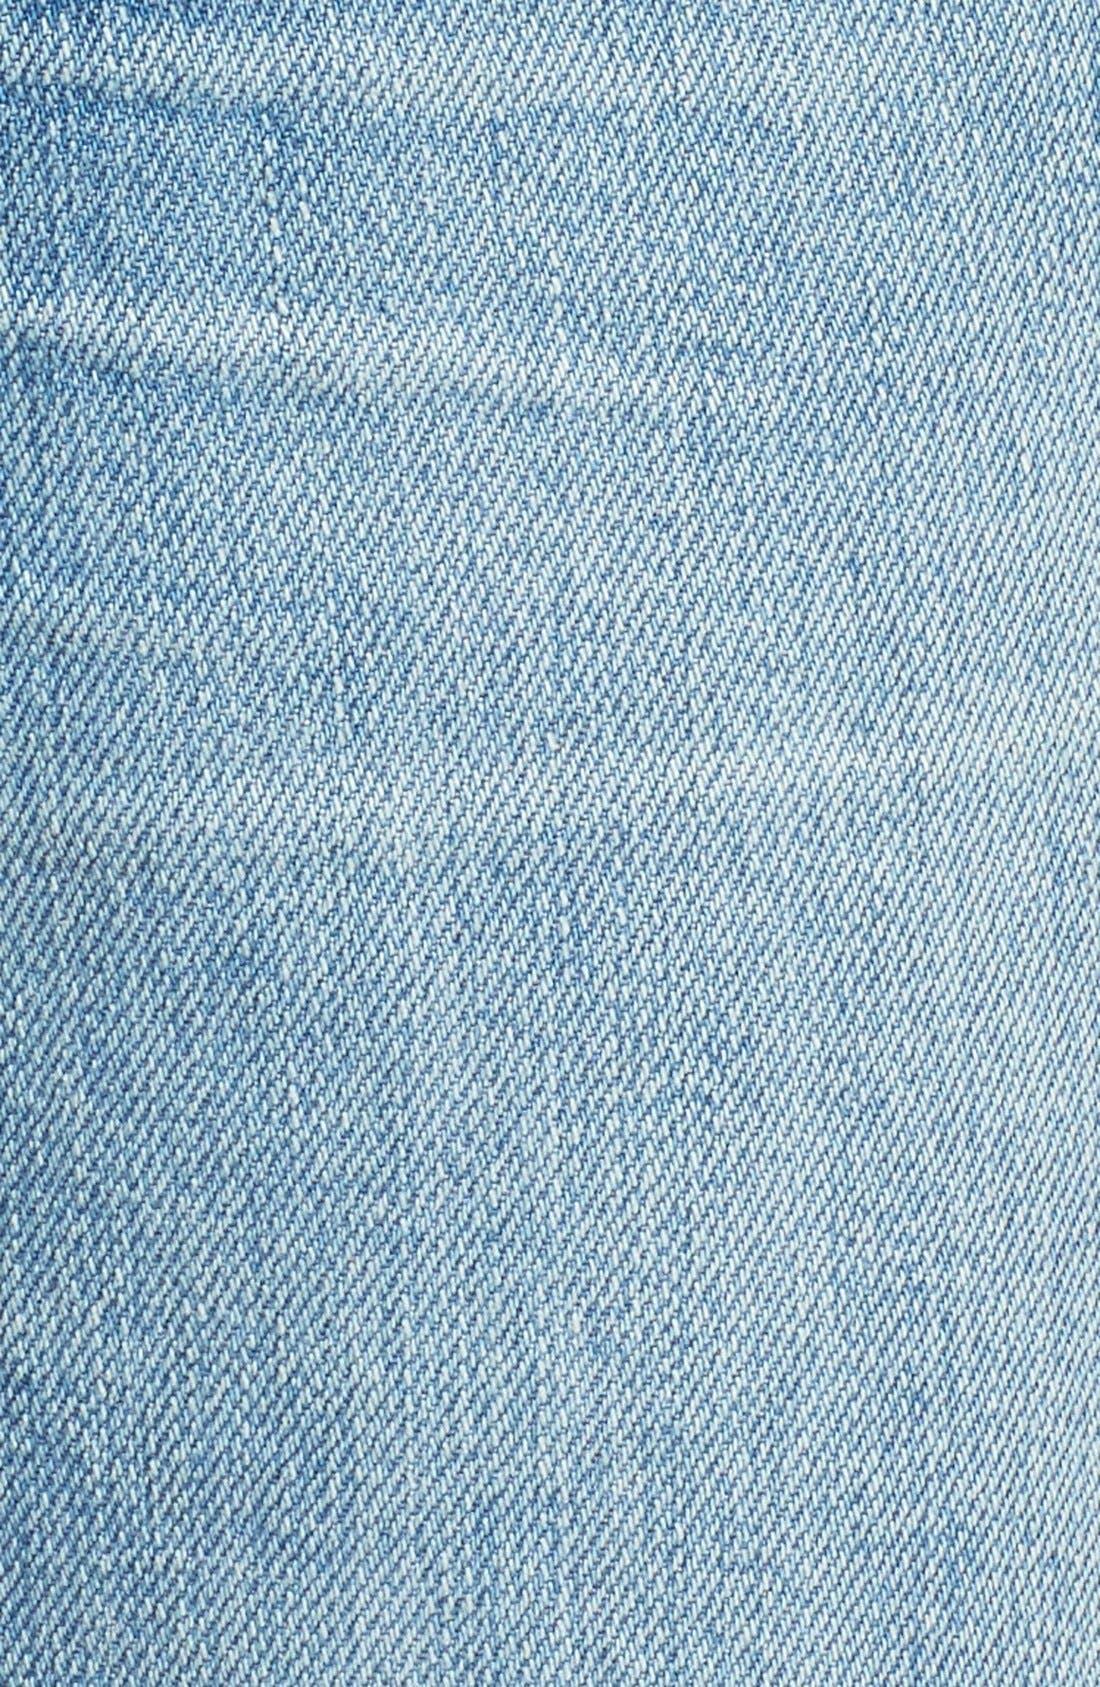 Perfect Vintage Ripped High Waist Boyfriend Jeans,                             Alternate thumbnail 5, color,                             Chet Wash